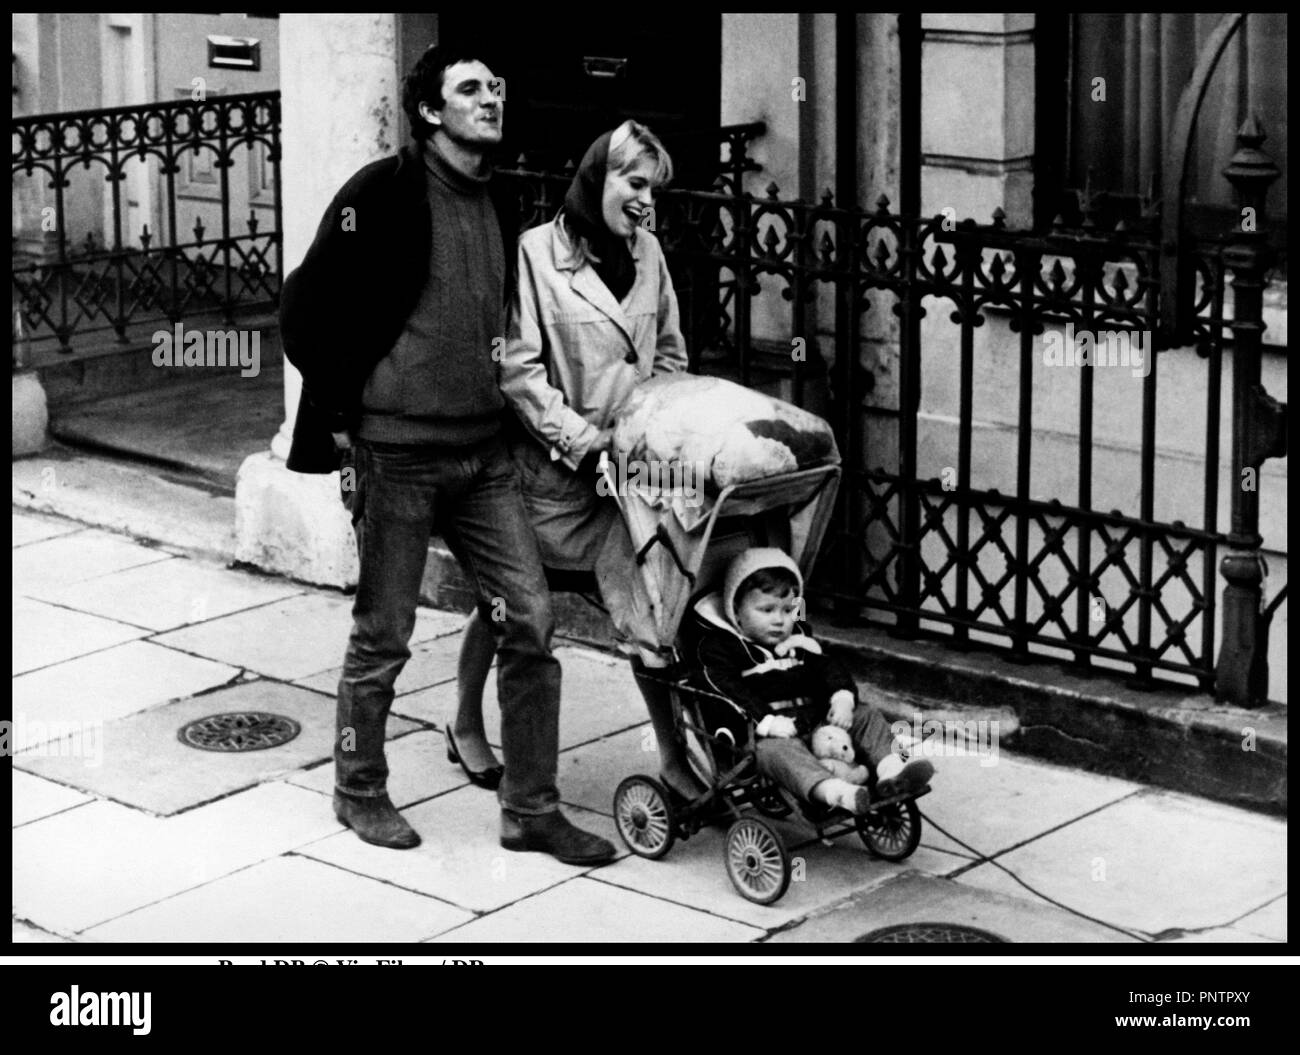 Jennifer Stone,David Ryall (1935?014) XXX pic Kathleen Noone born January 8, 1945 (age 73),Natalie Press